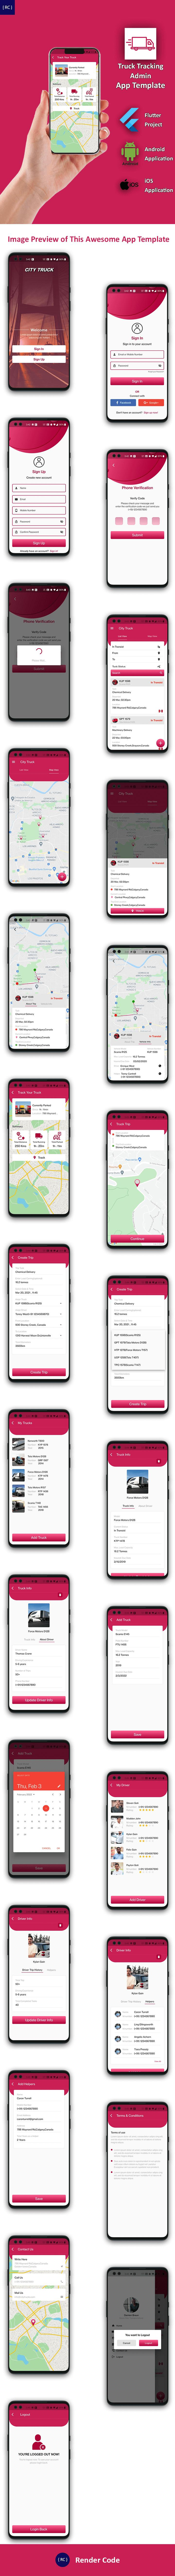 Truck Tracking Android + iOS App Template   2 Apps   Truck App   Flutter   CityTruck - 5